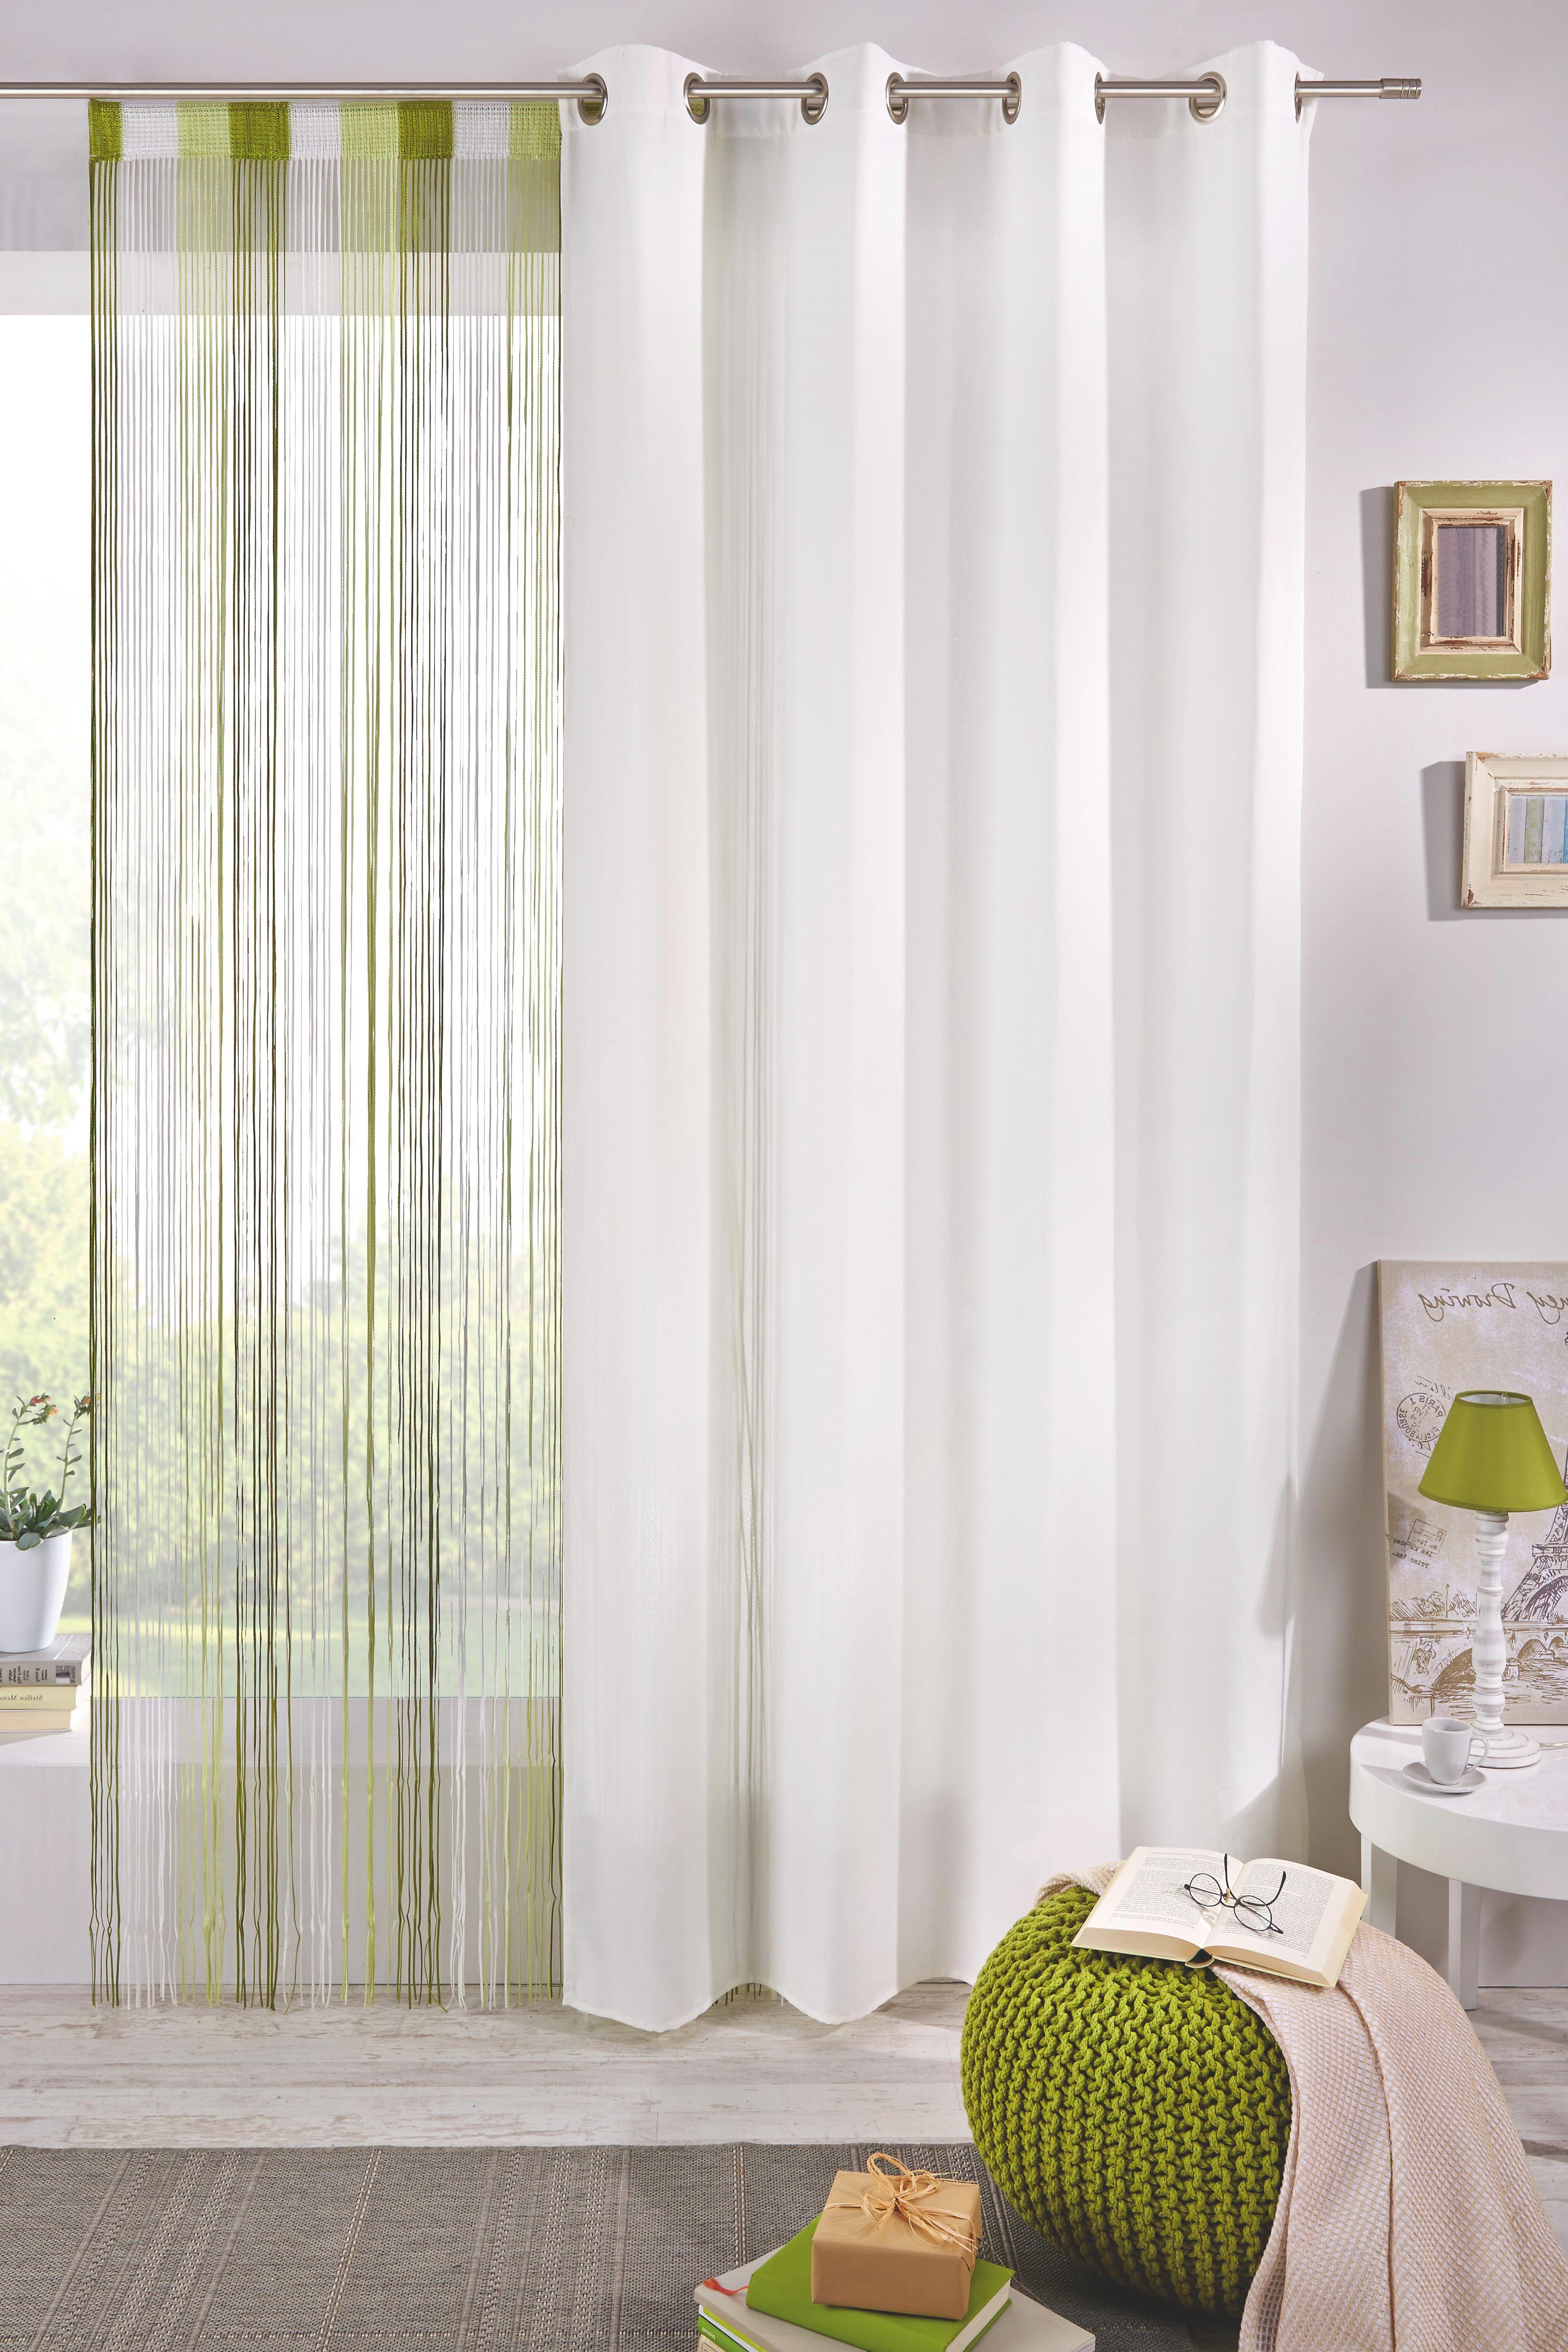 Zsinórfüggöny String - világoszöld/fehér, textil (90/245cm) - premium living